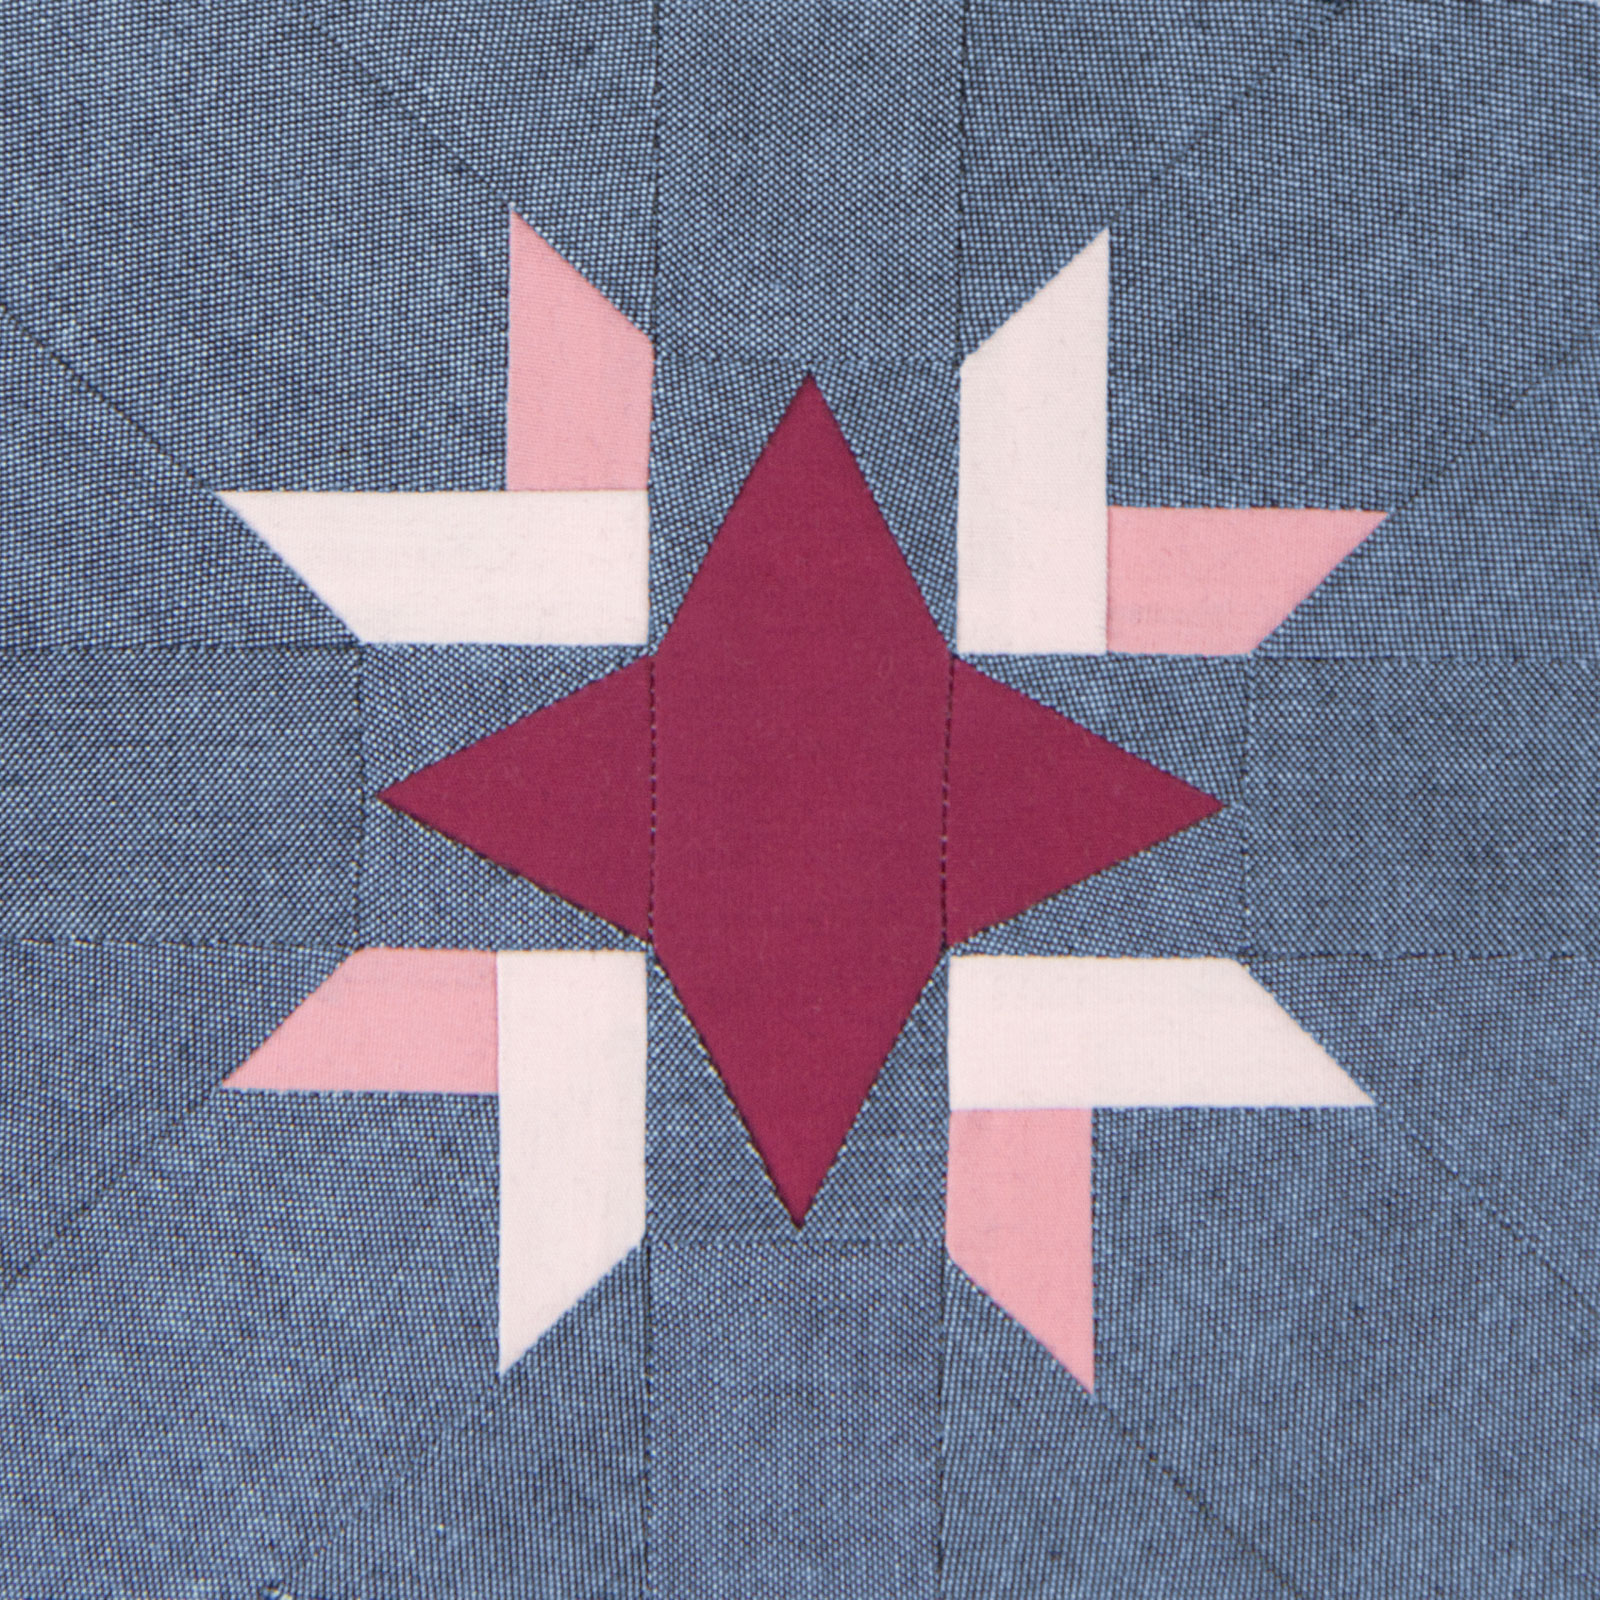 Lodestars quilt block #22: Andrea